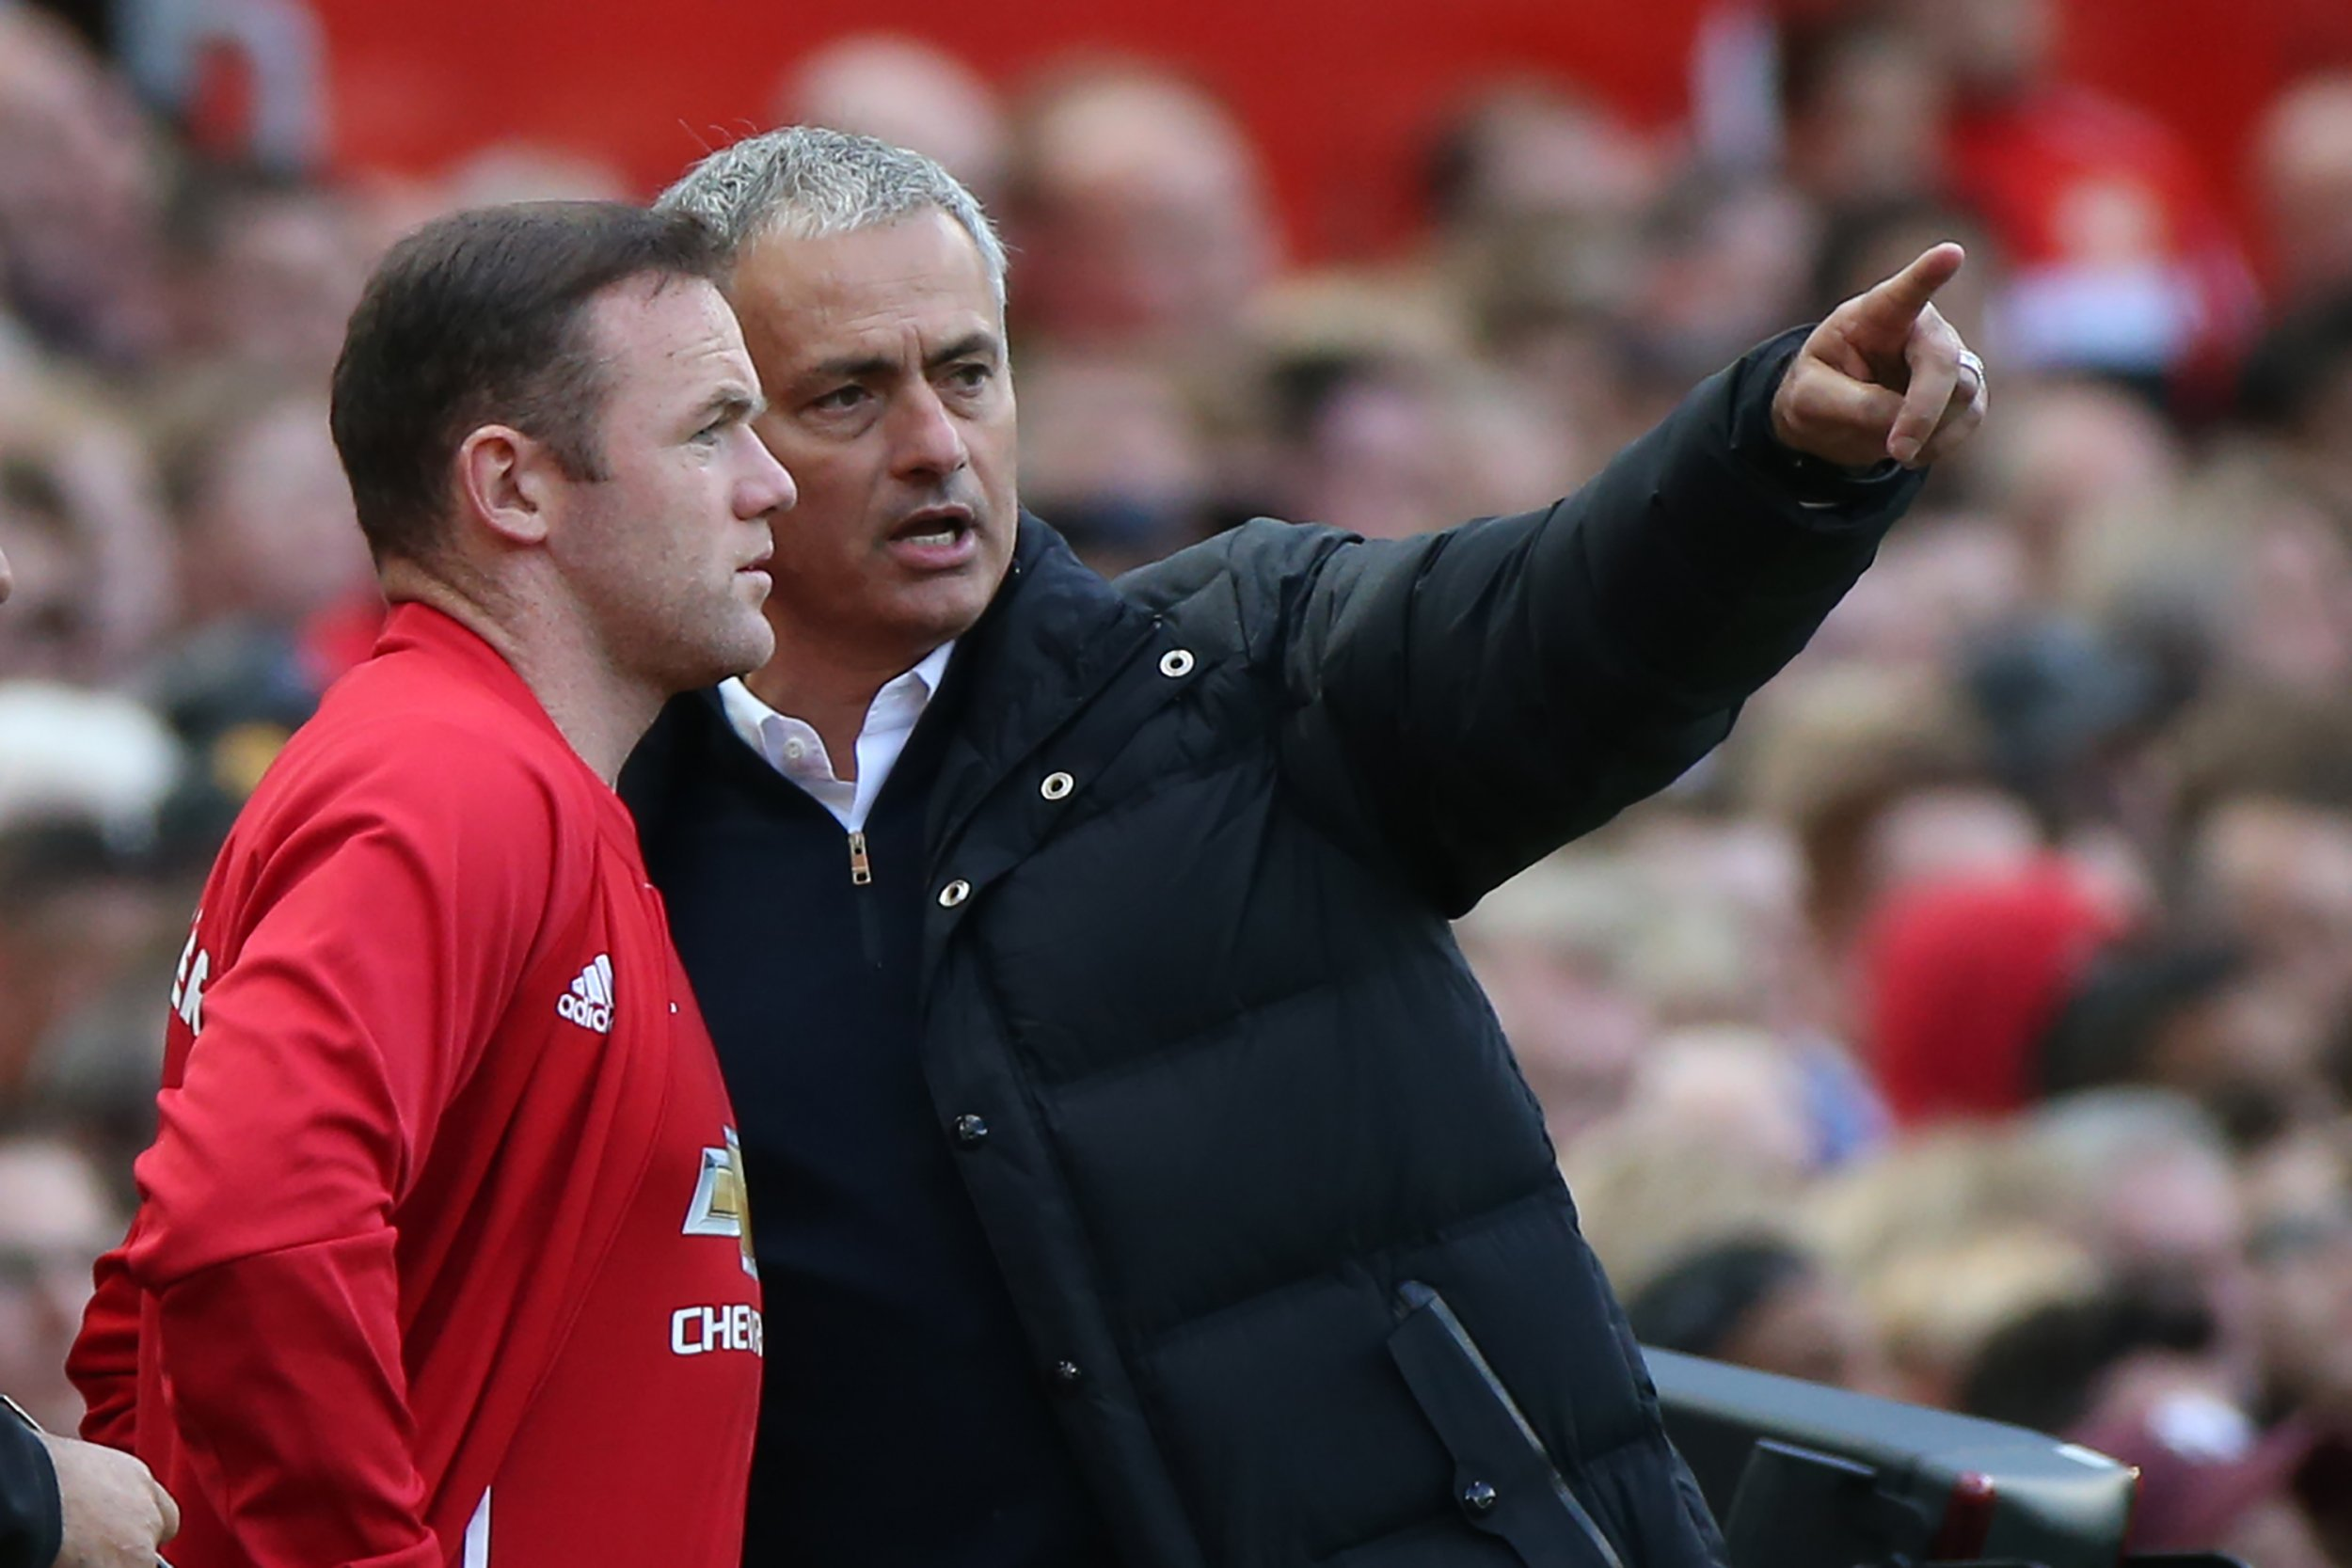 Wayne Rooney, left, with Manchester United manager Jose Mourinho.